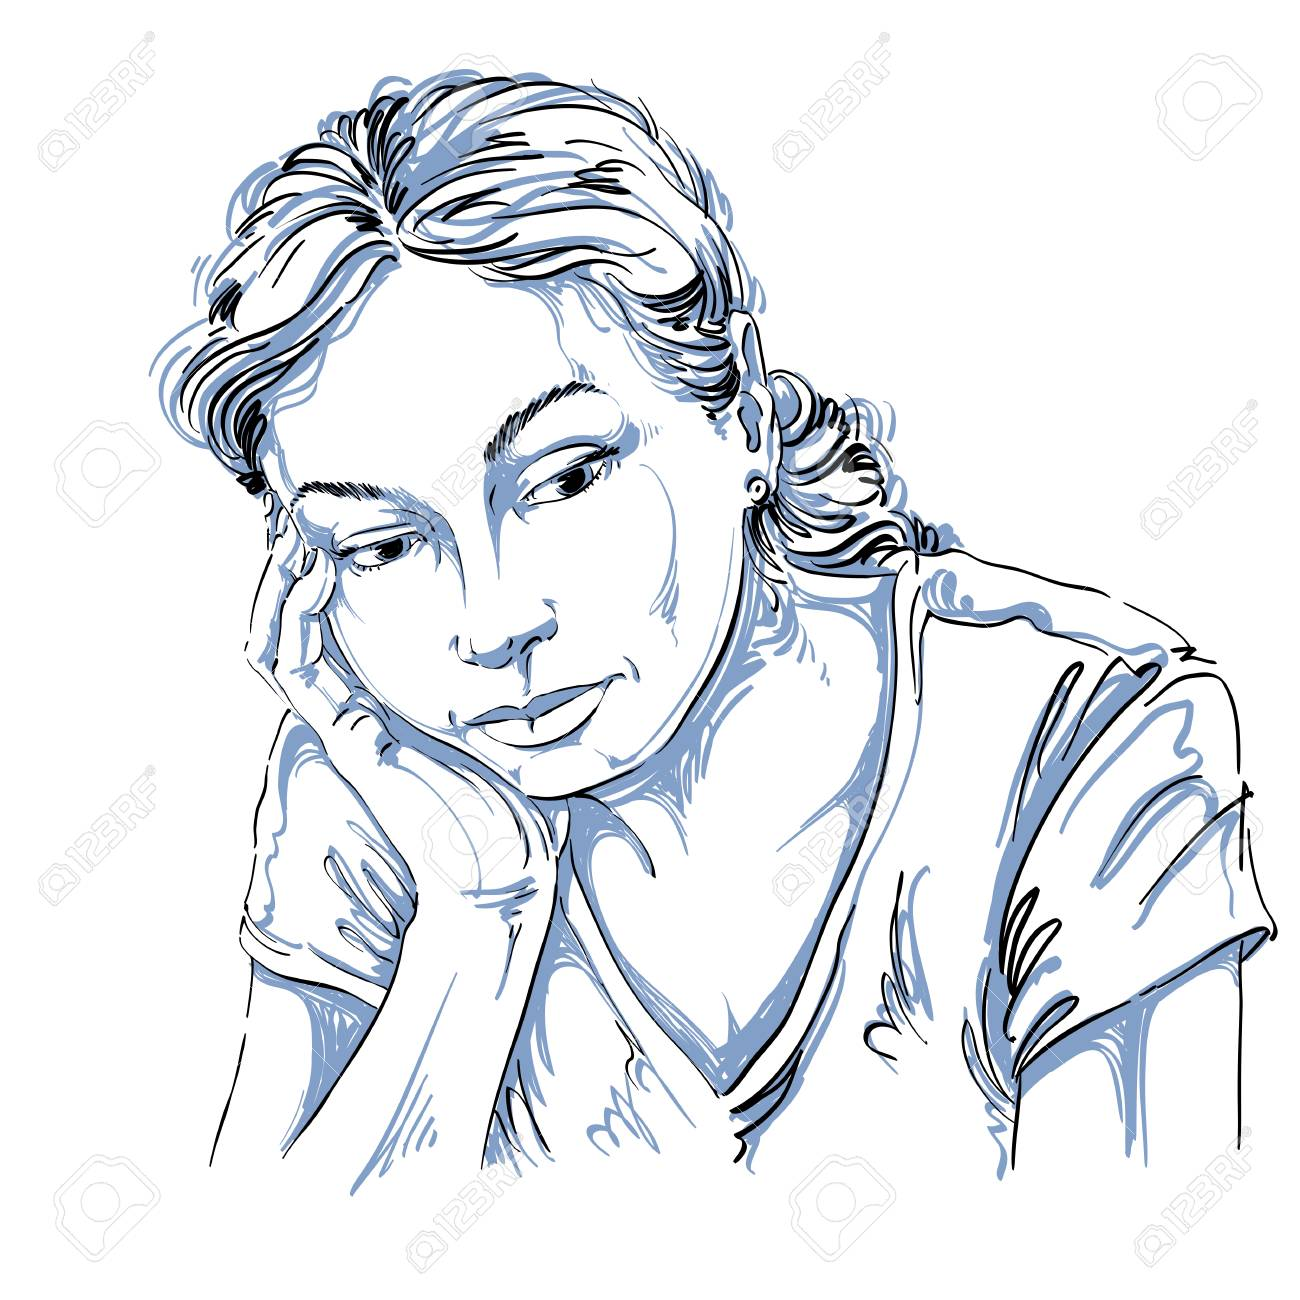 Vector Art Dessin Portrait Triste Et Deprime Fille Penser A